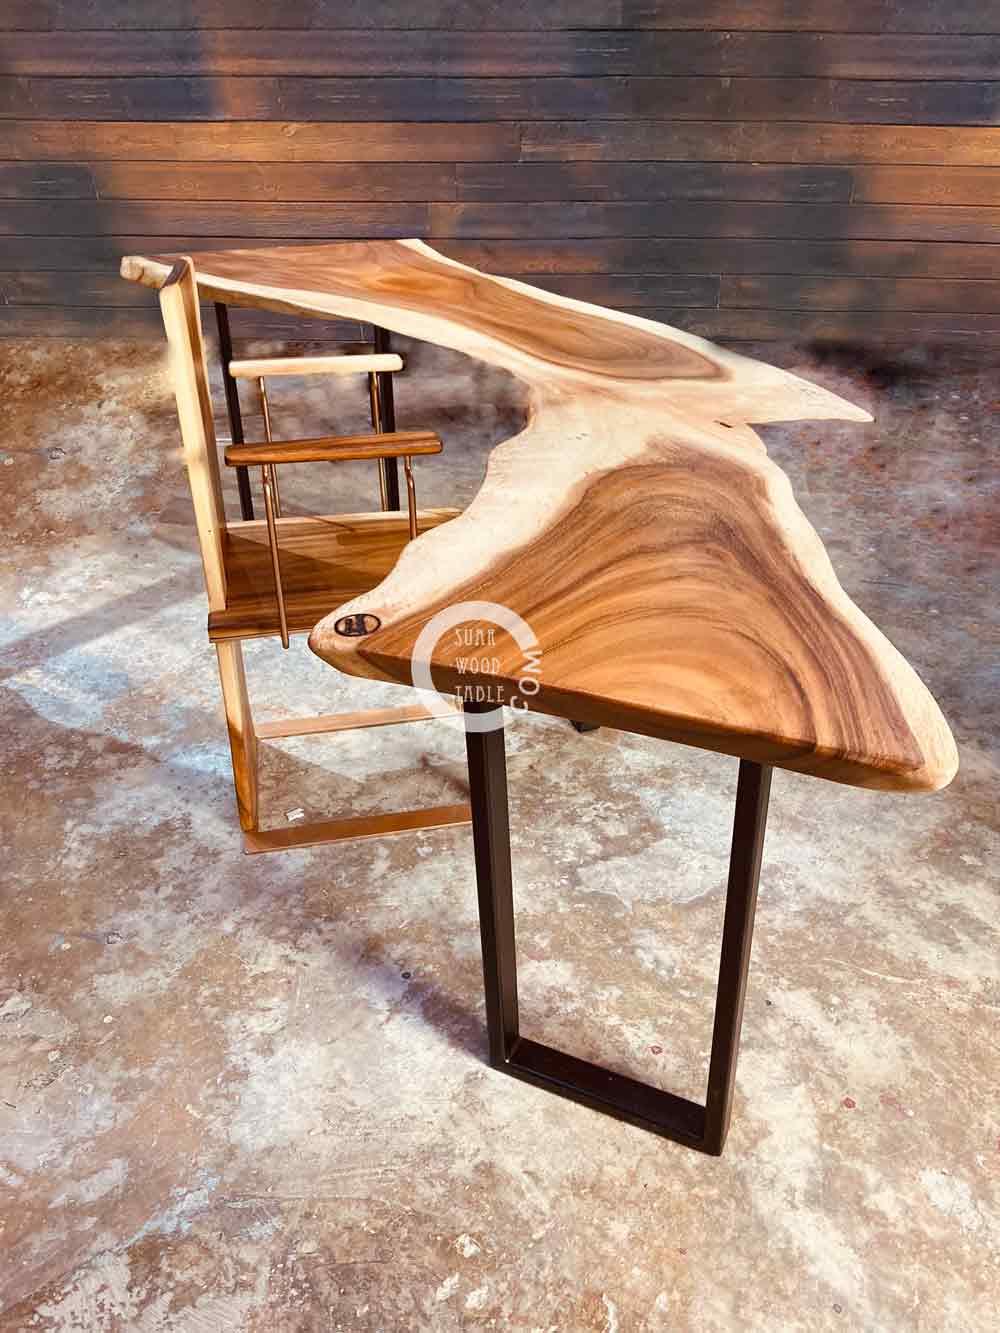 handmade wooden work table